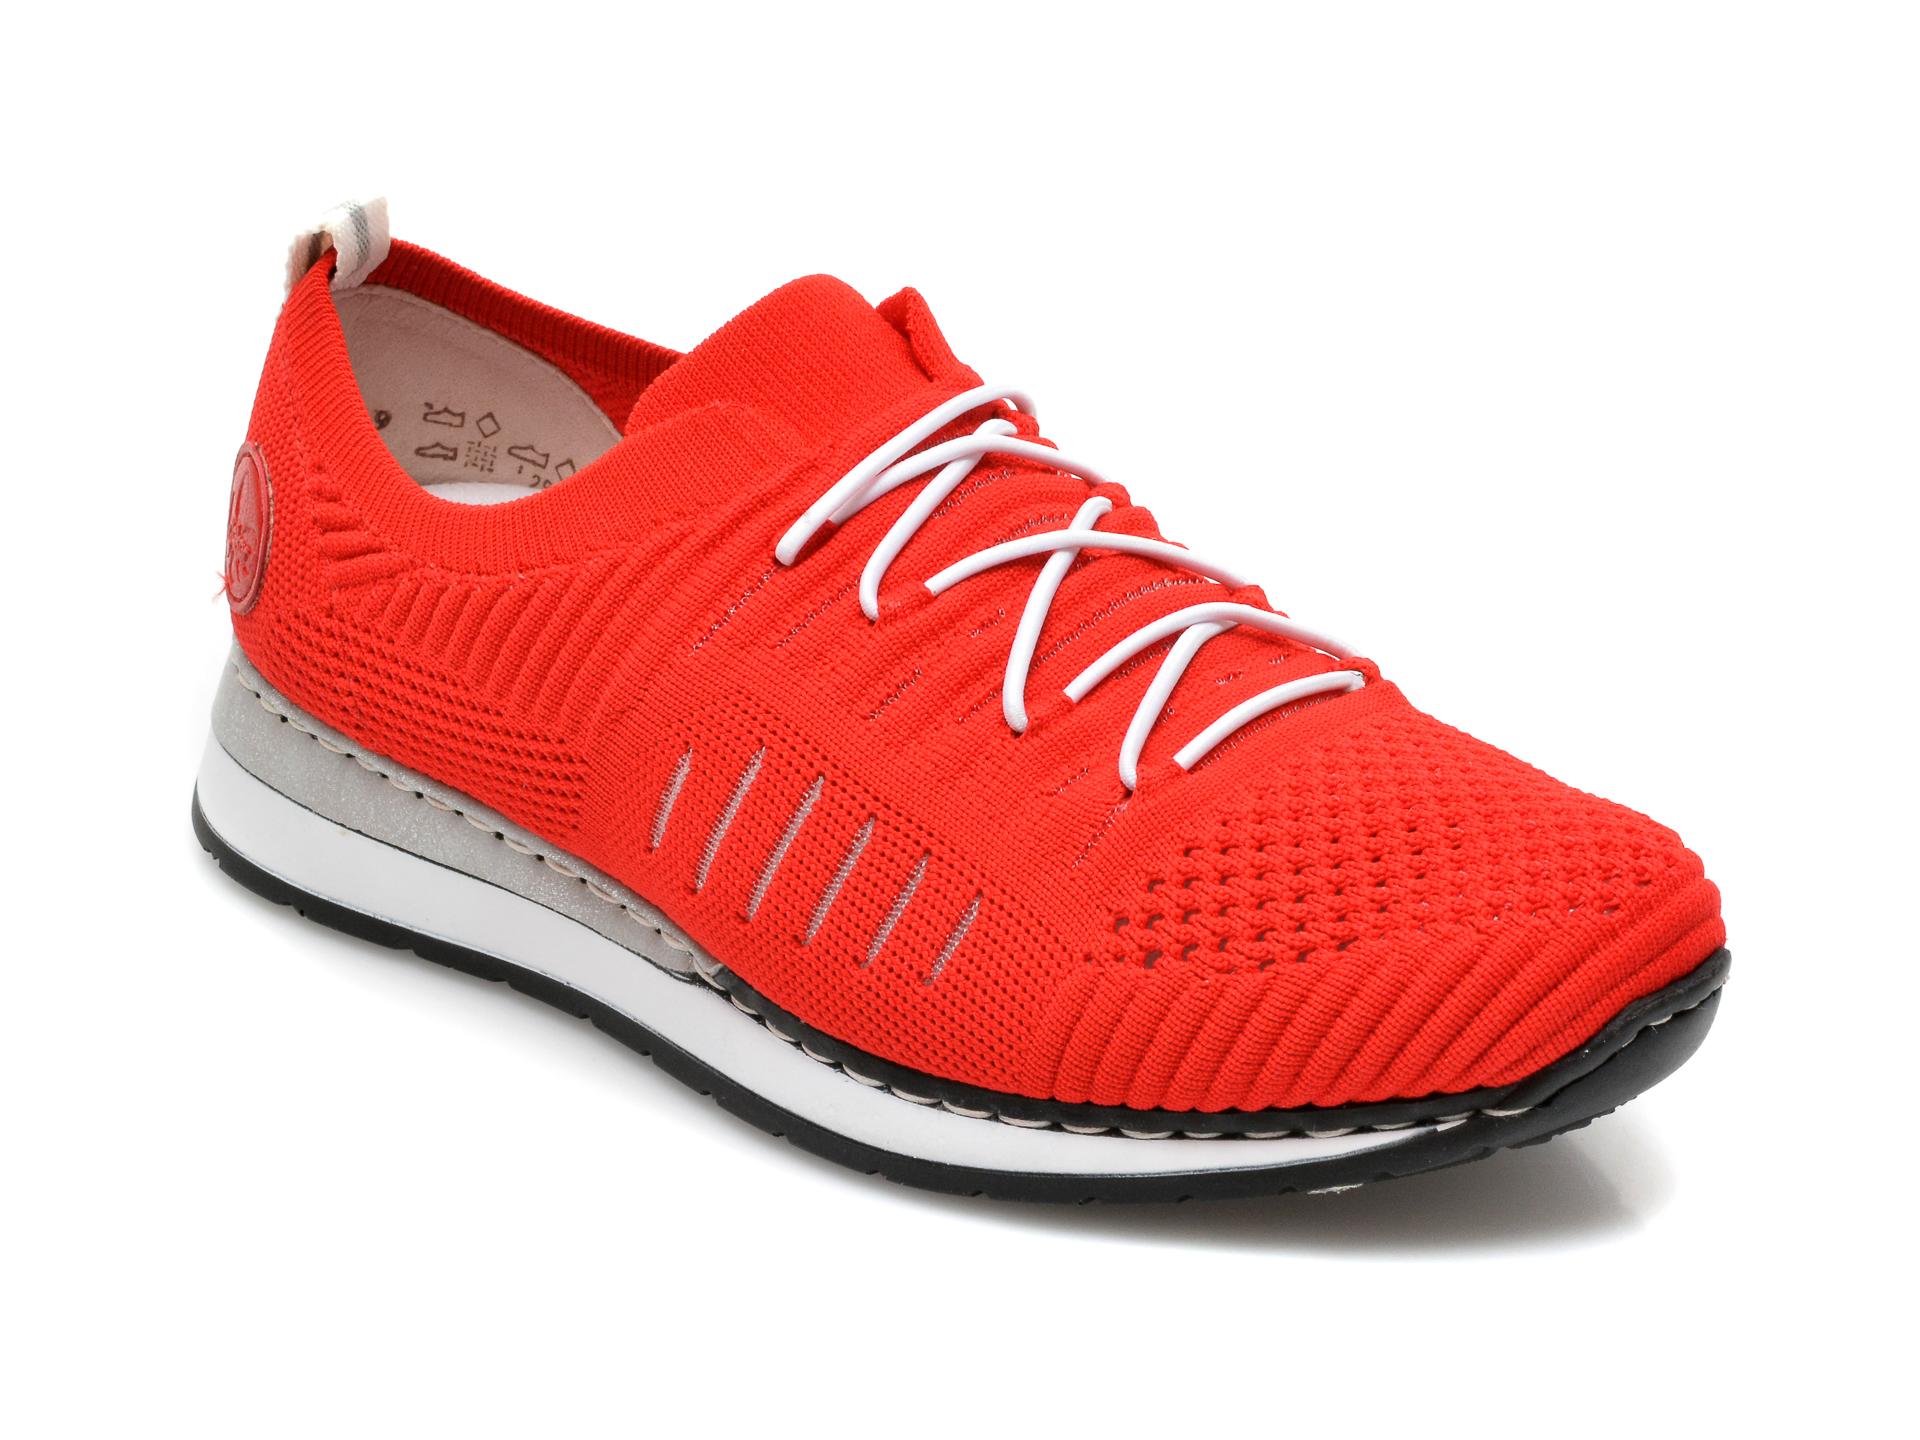 Pantofi sport RIEKER rosii, N3075, din material textil imagine otter.ro 2021